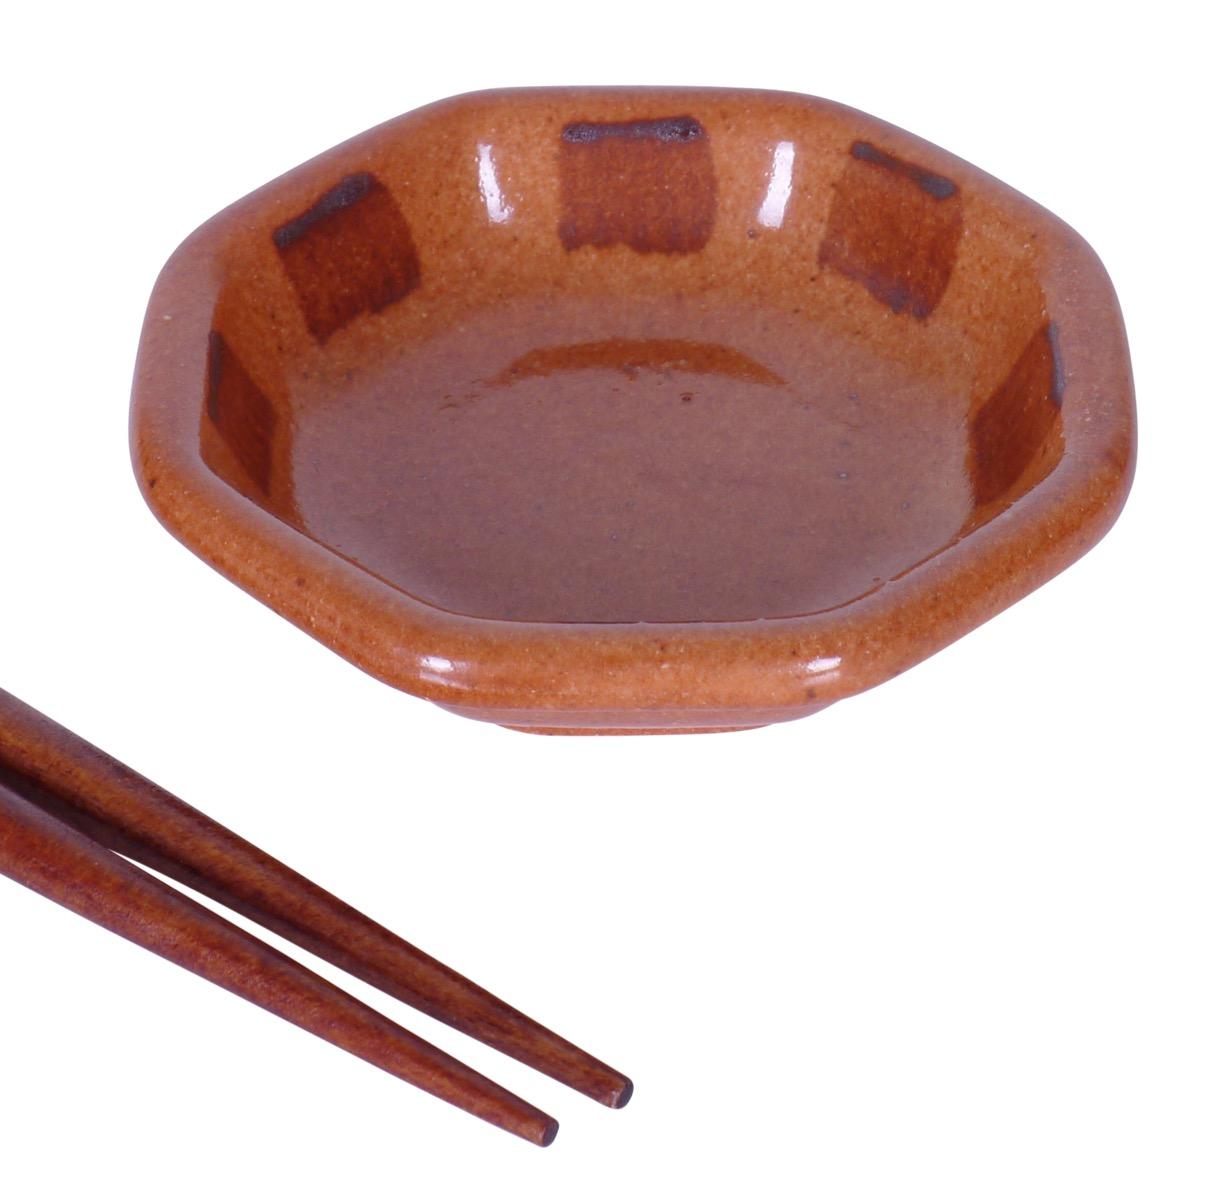 Image of Porcelain Hexagon Appetizer Dish, Handglazed Orange  3.5-Inch